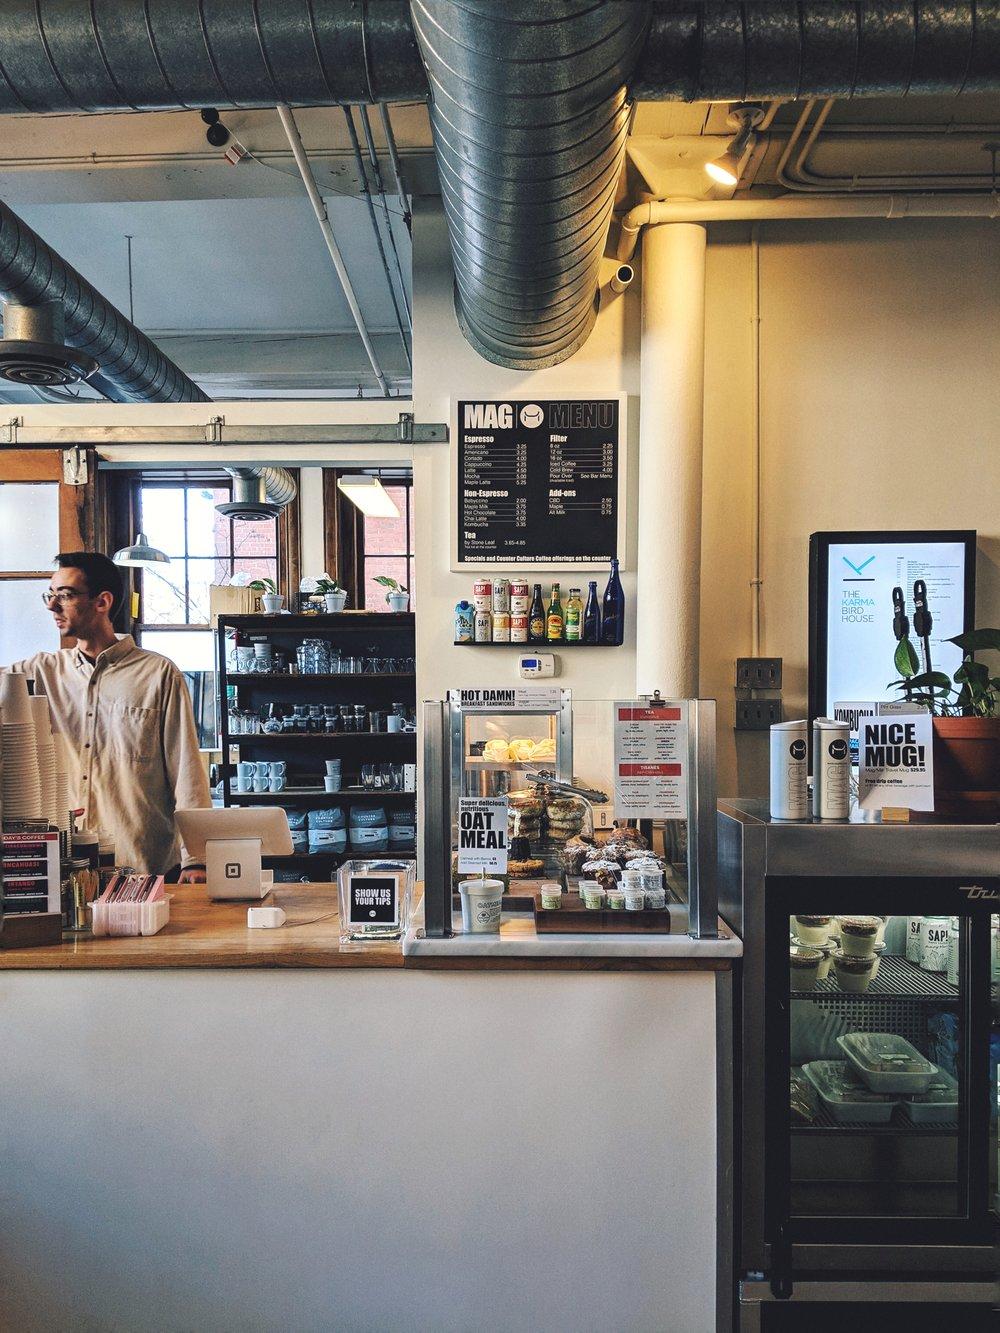 Maglianero Cafe.jpeg